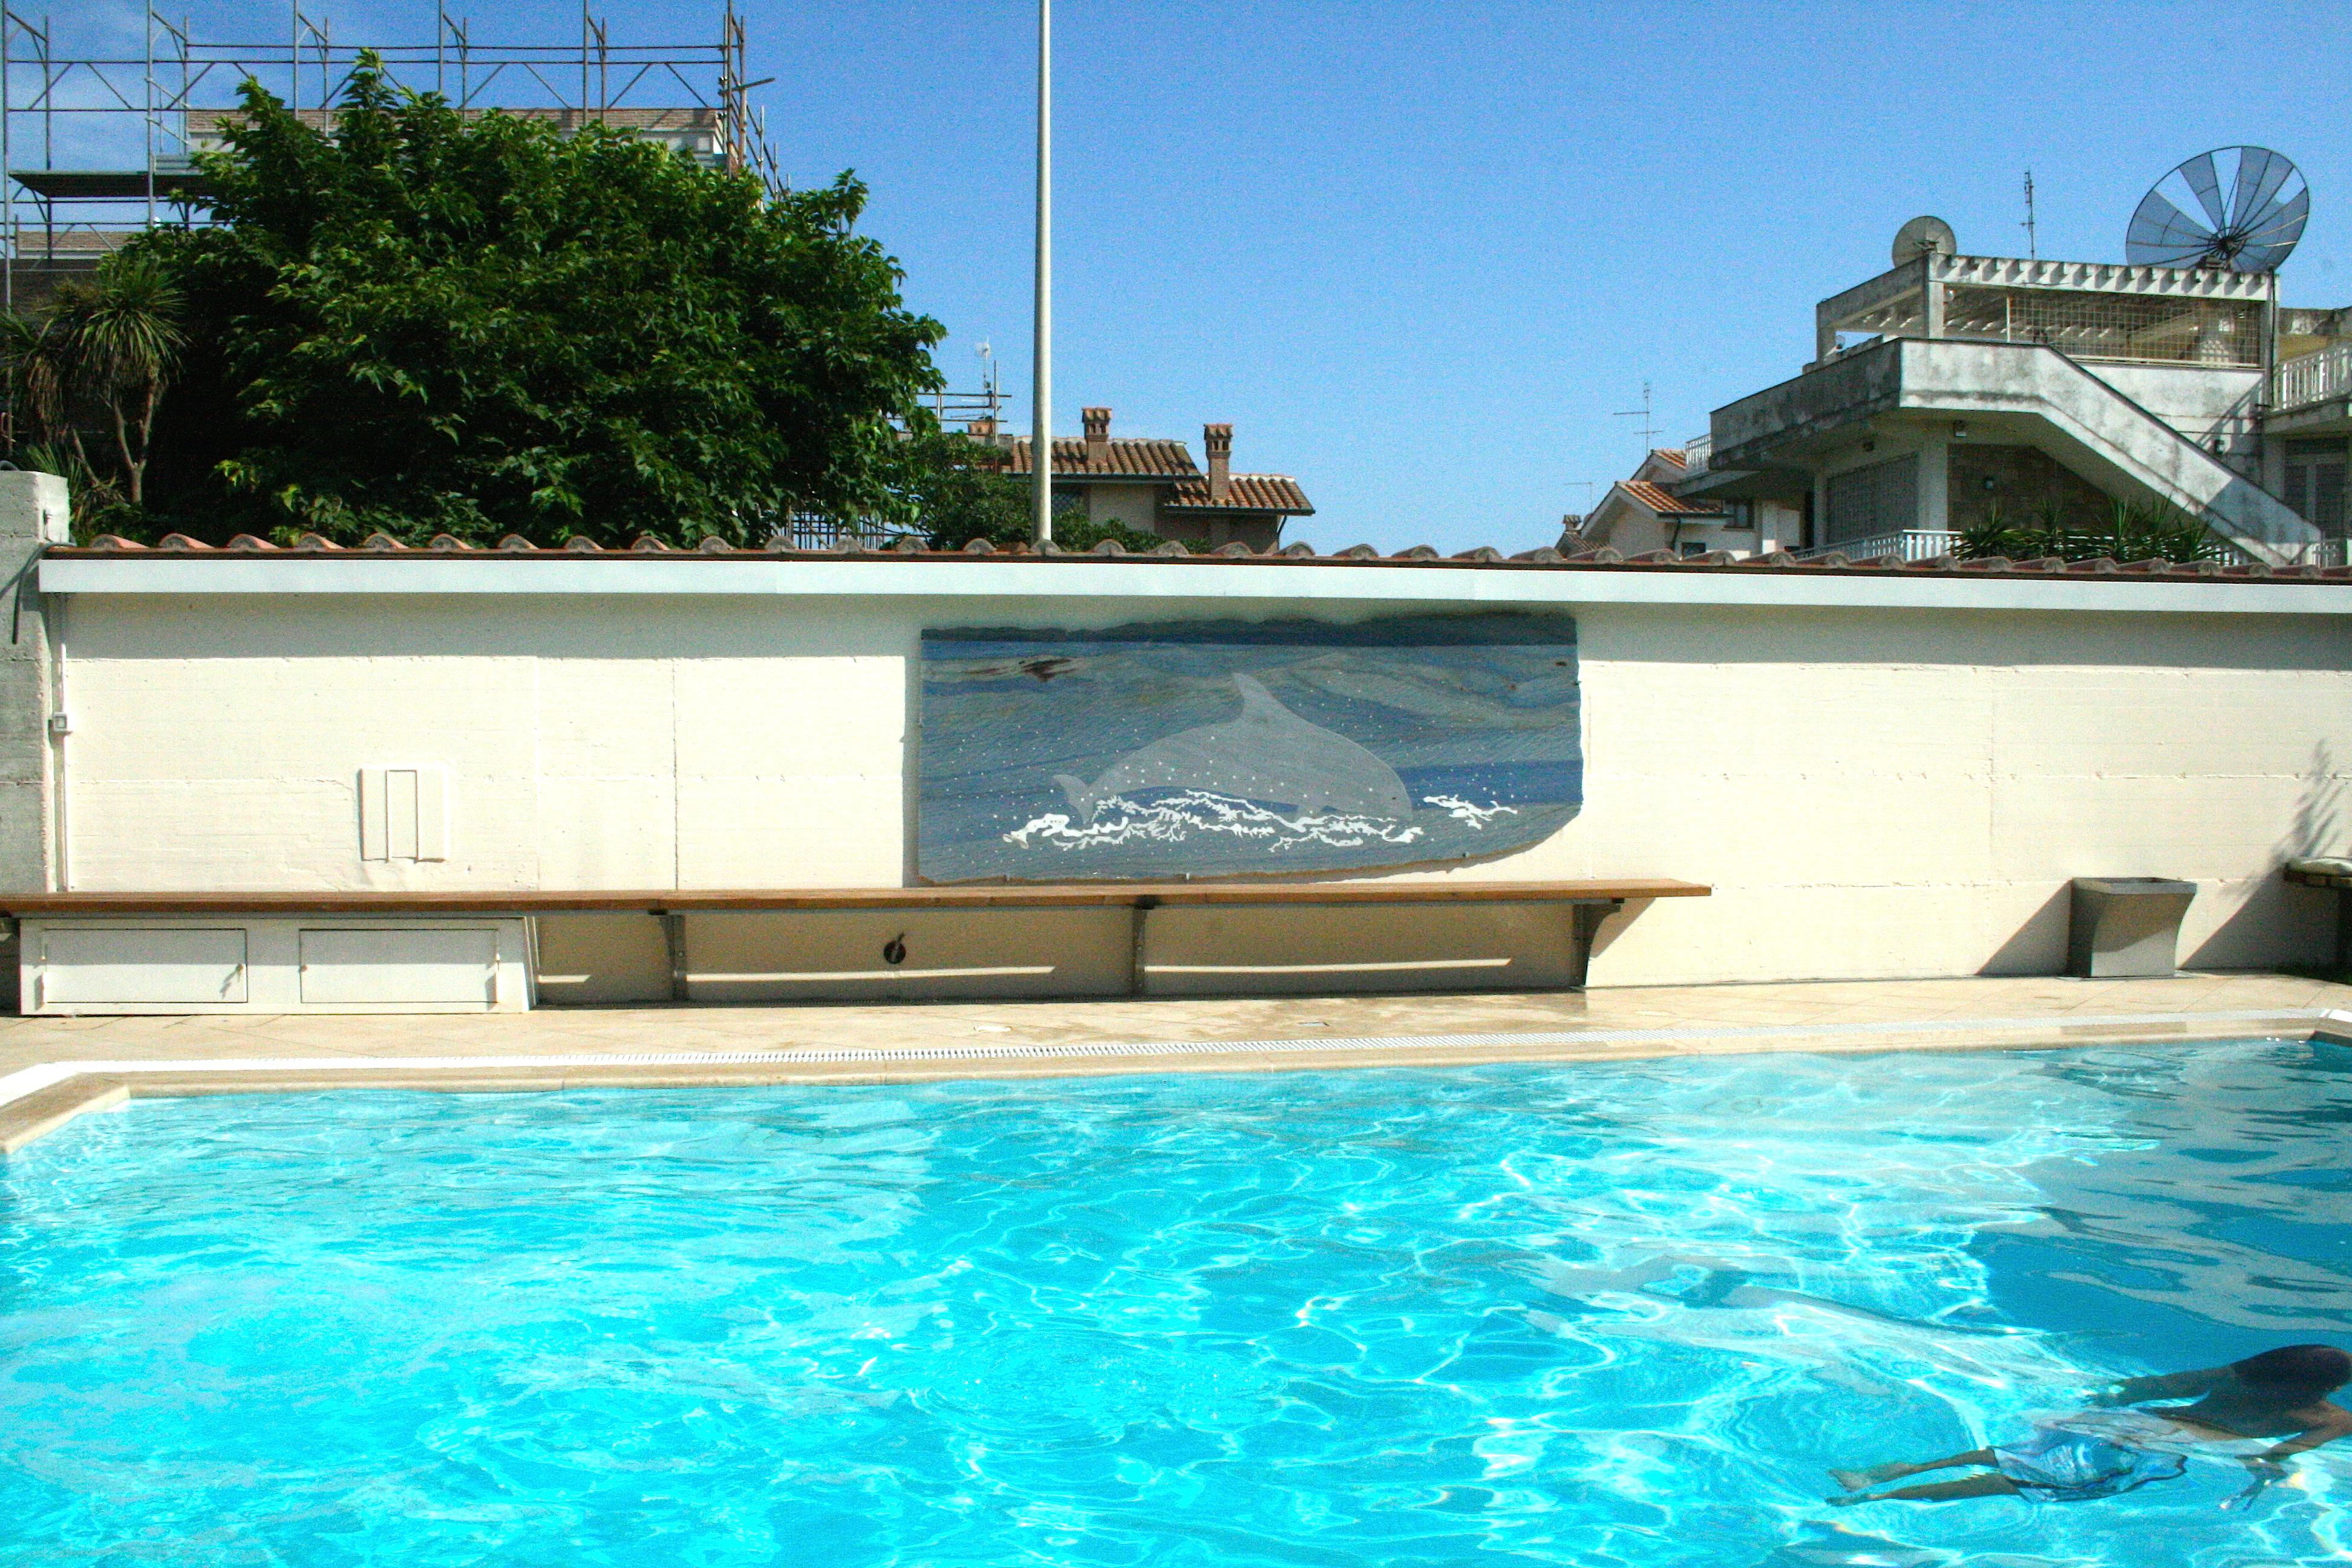 Garden design swimming pool stefano scarani designer 101 for Pool design 101